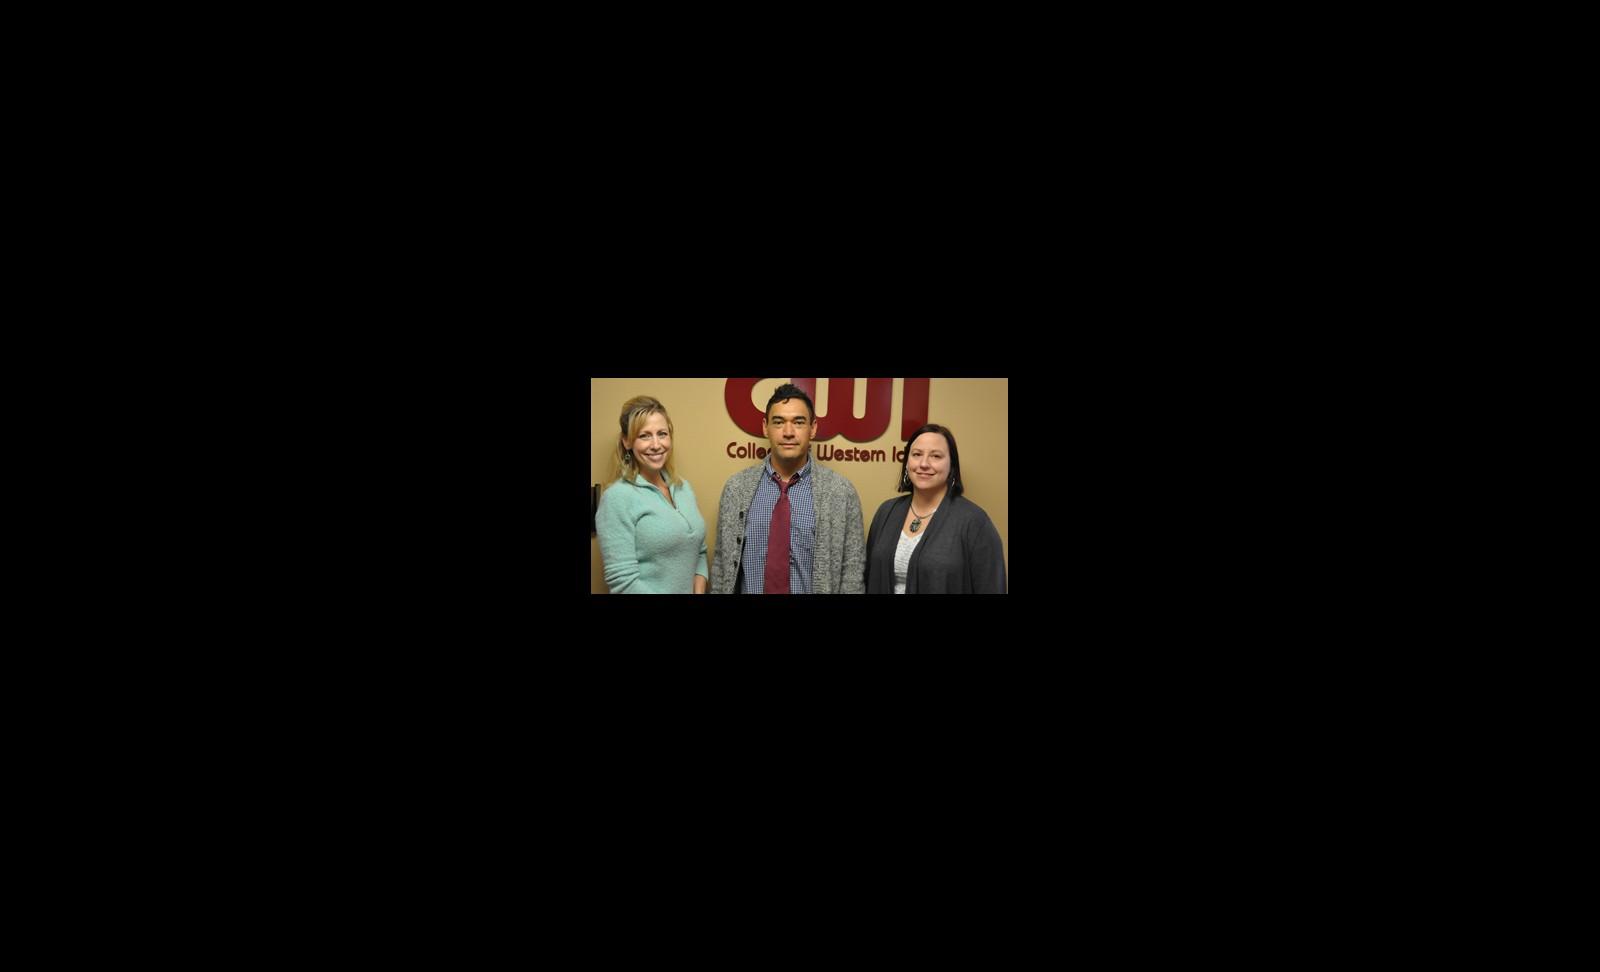 (Left to right) Rebecca Evans, Matthew Haynes, and Belinda Reyff.